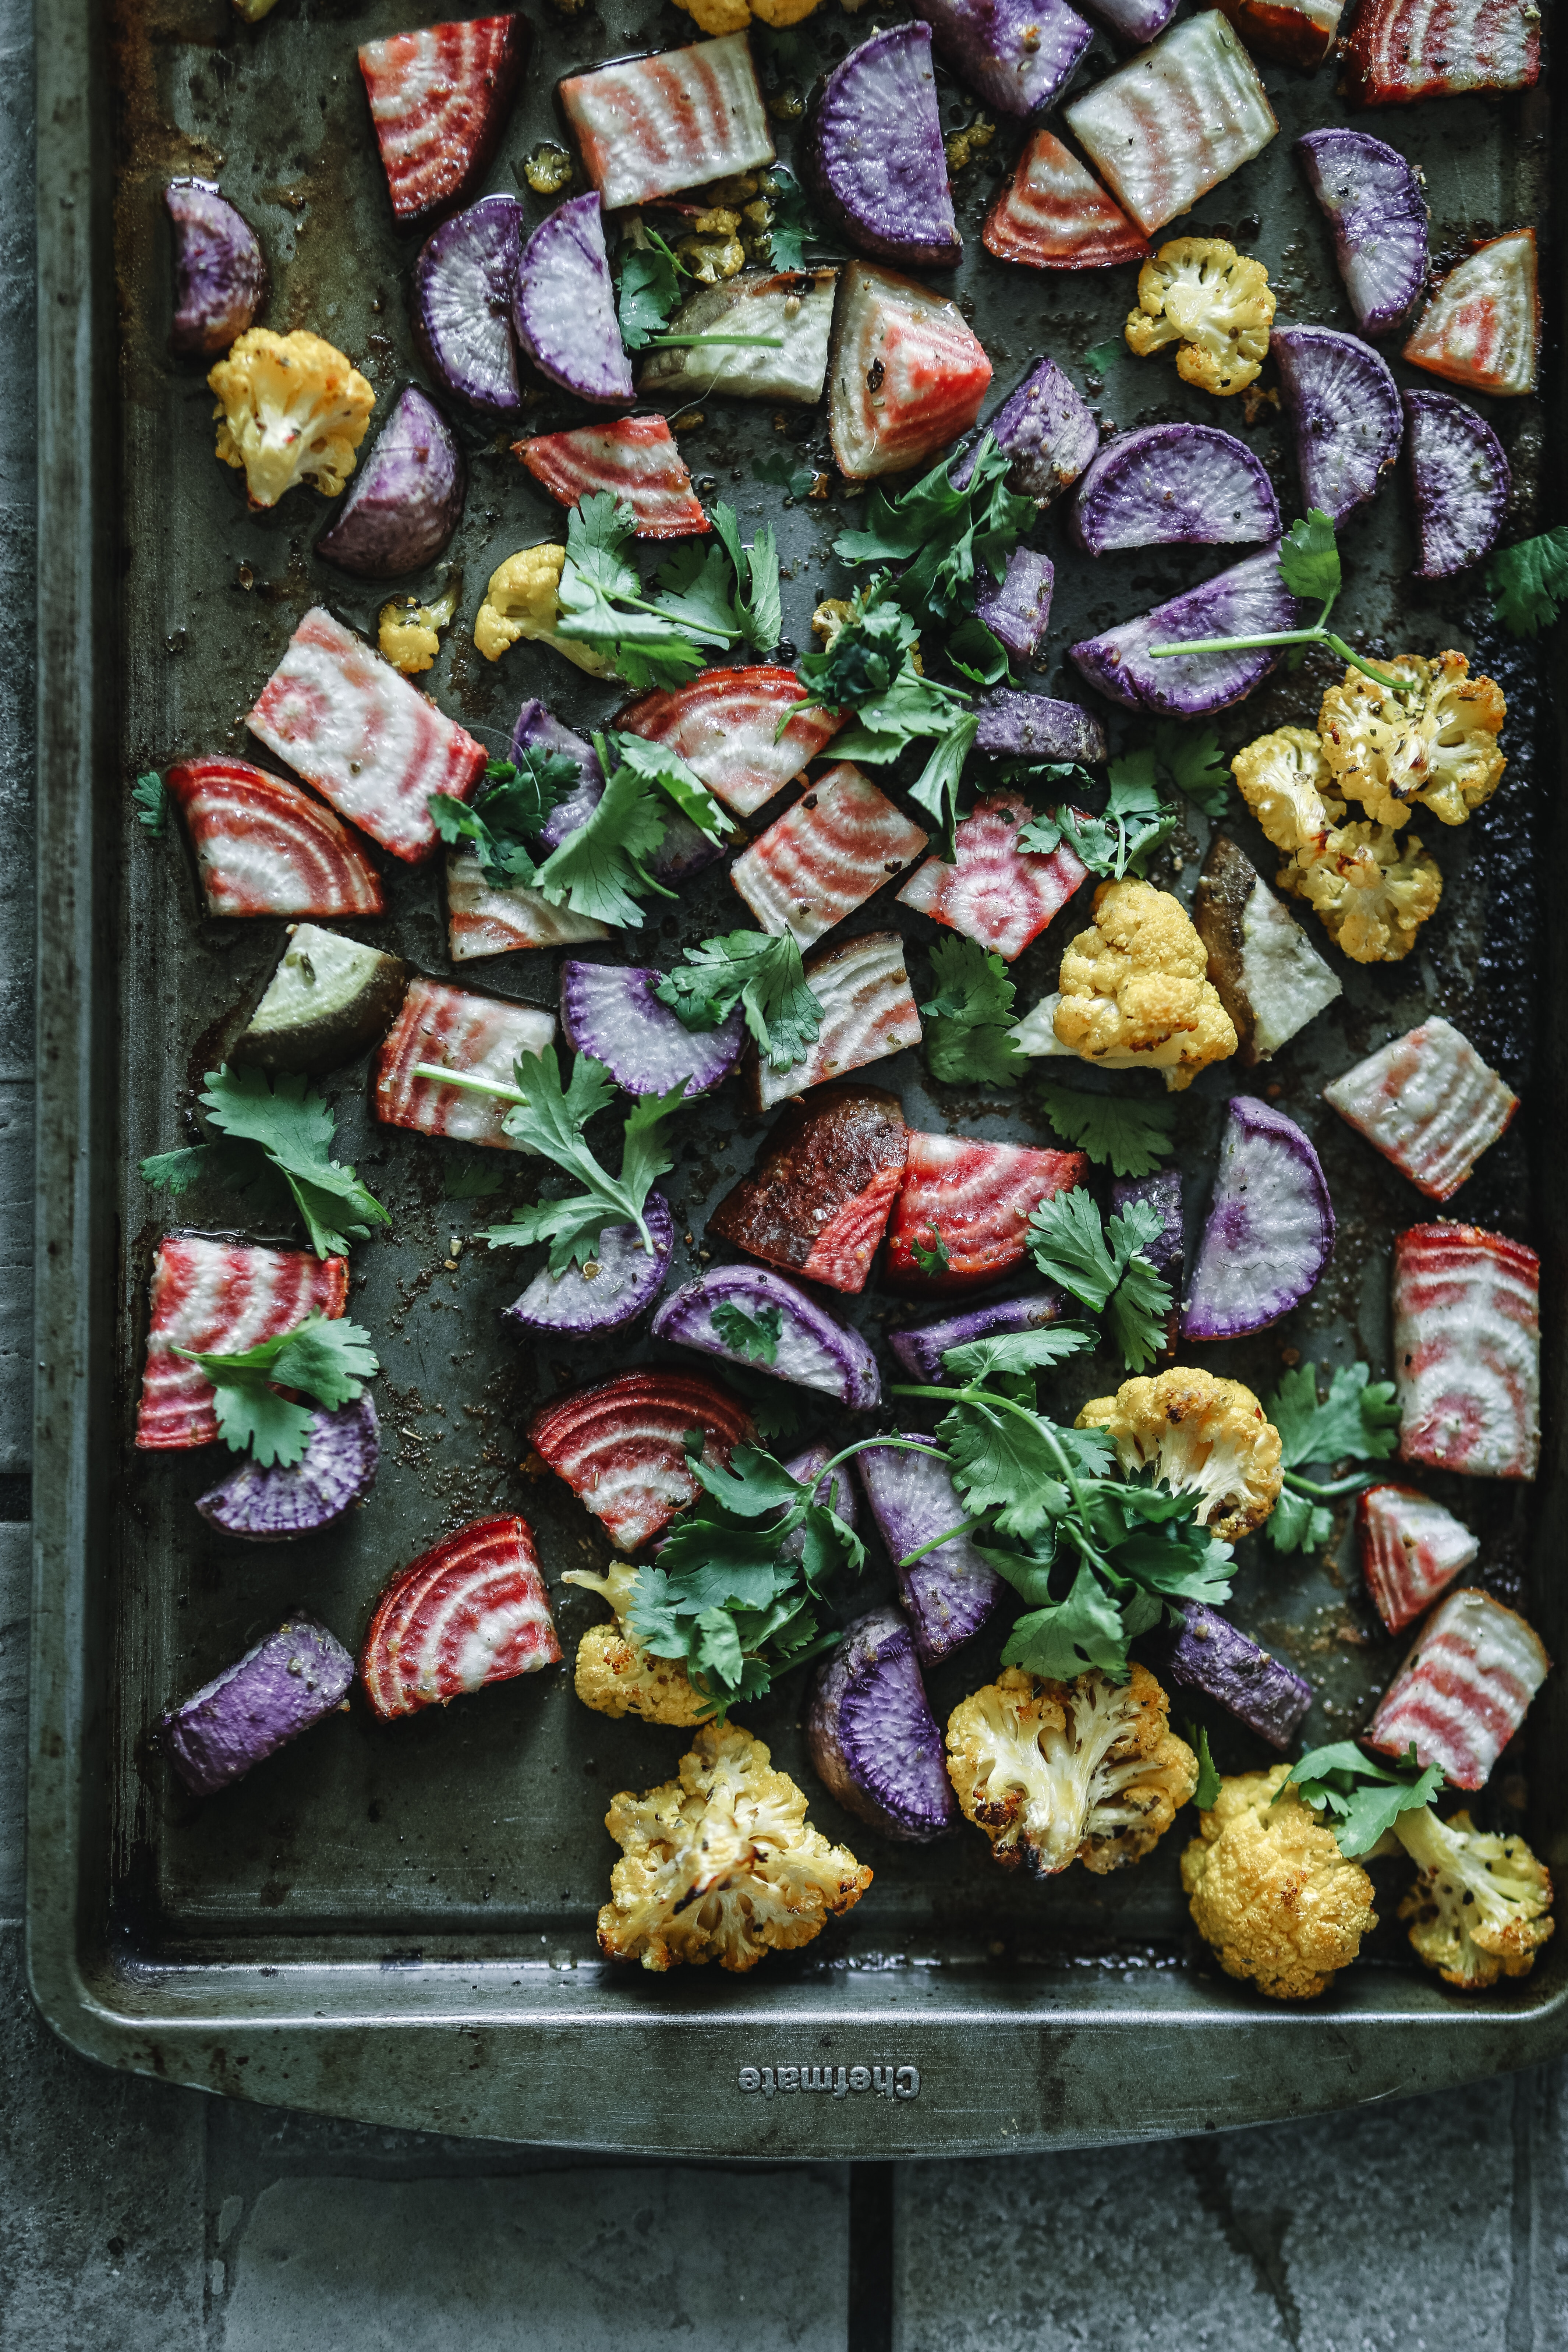 rode bieten oven recepten januari seizoensgroenten